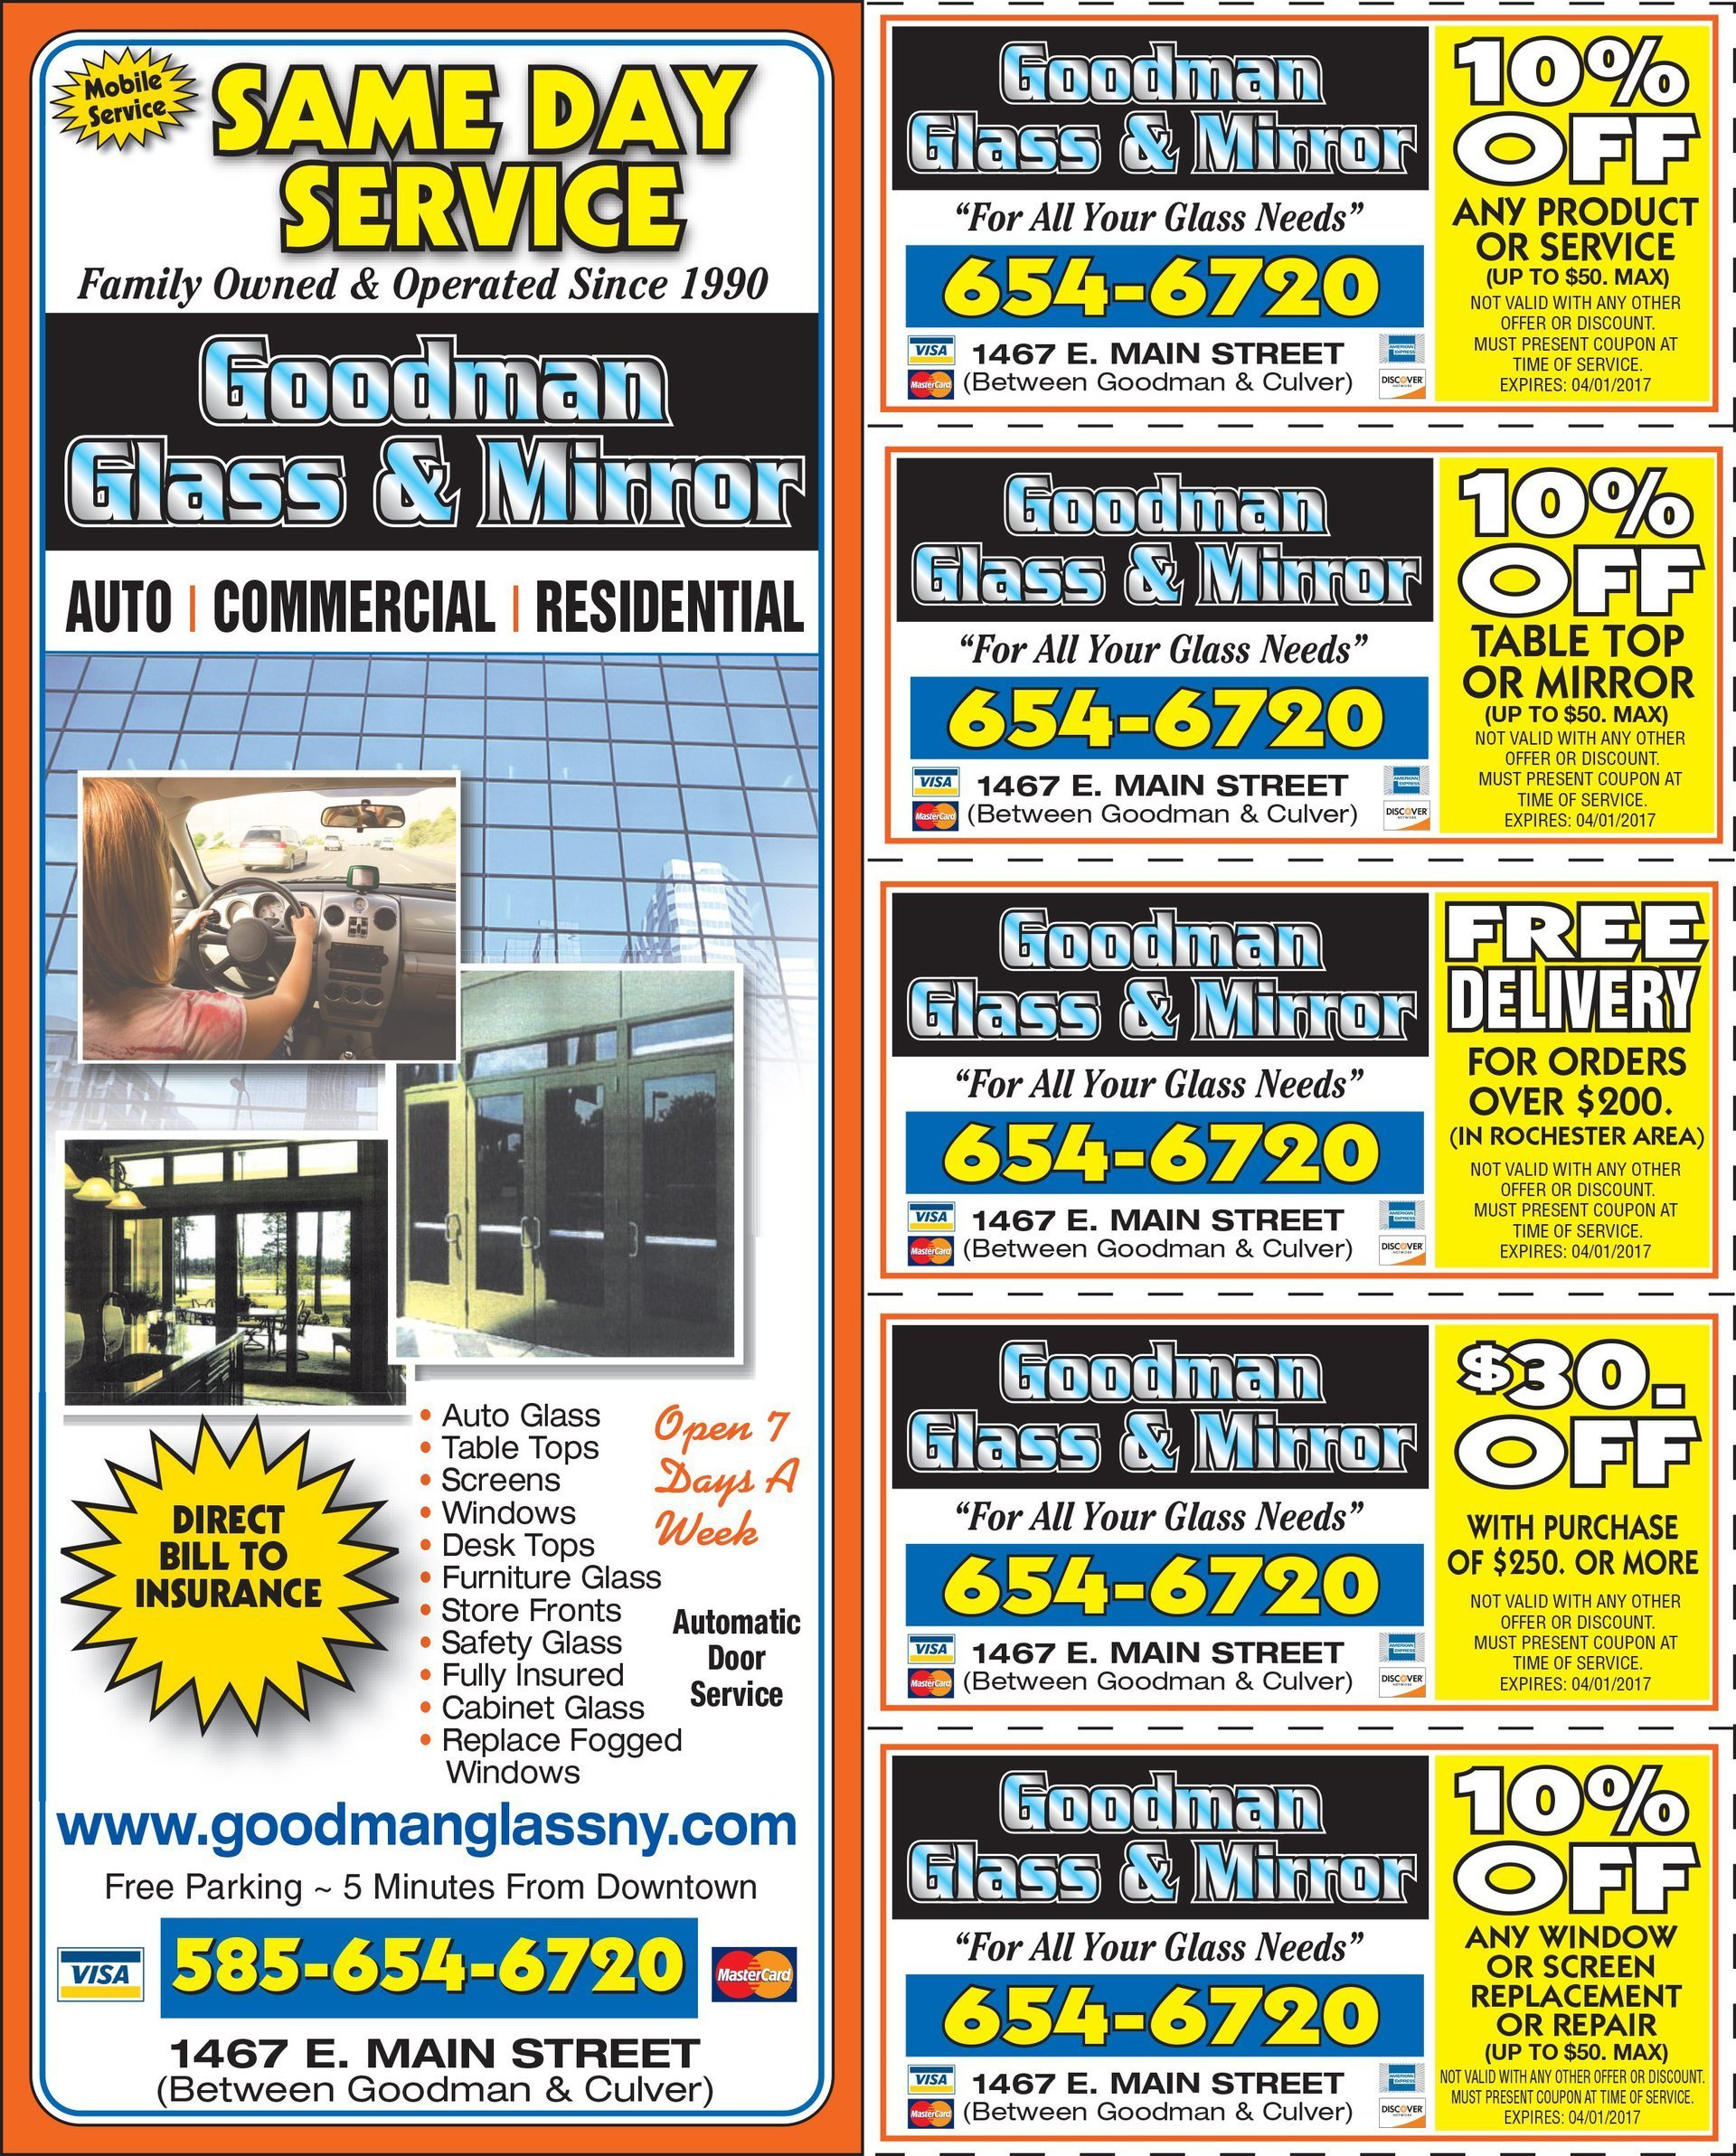 Goodman glass & mirror coupons